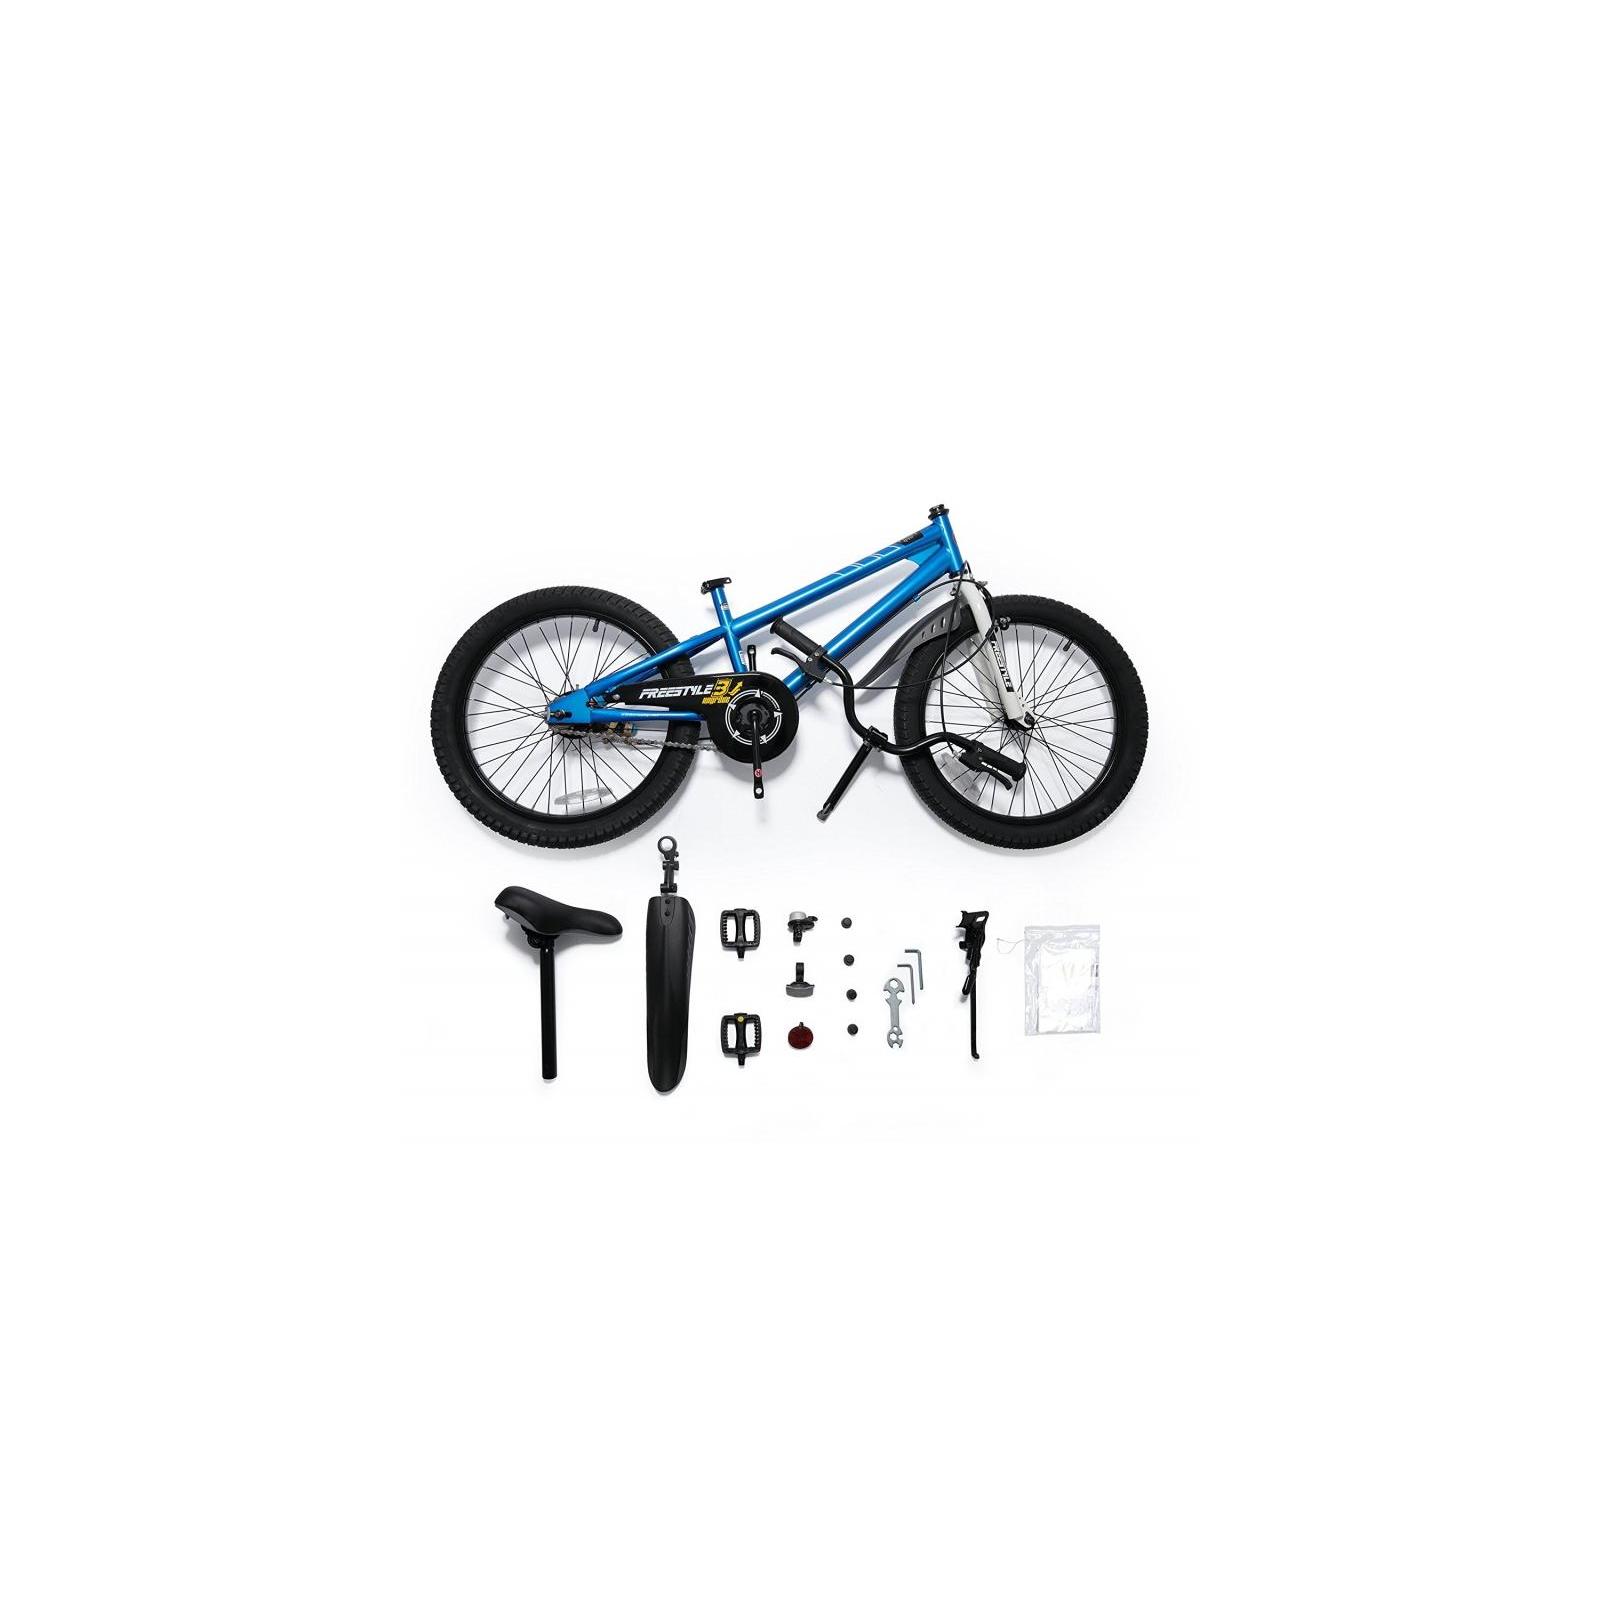 "Велосипед Royal Baby FREESTYLE 20"", синий (RB20B-6-BLU) изображение 6"